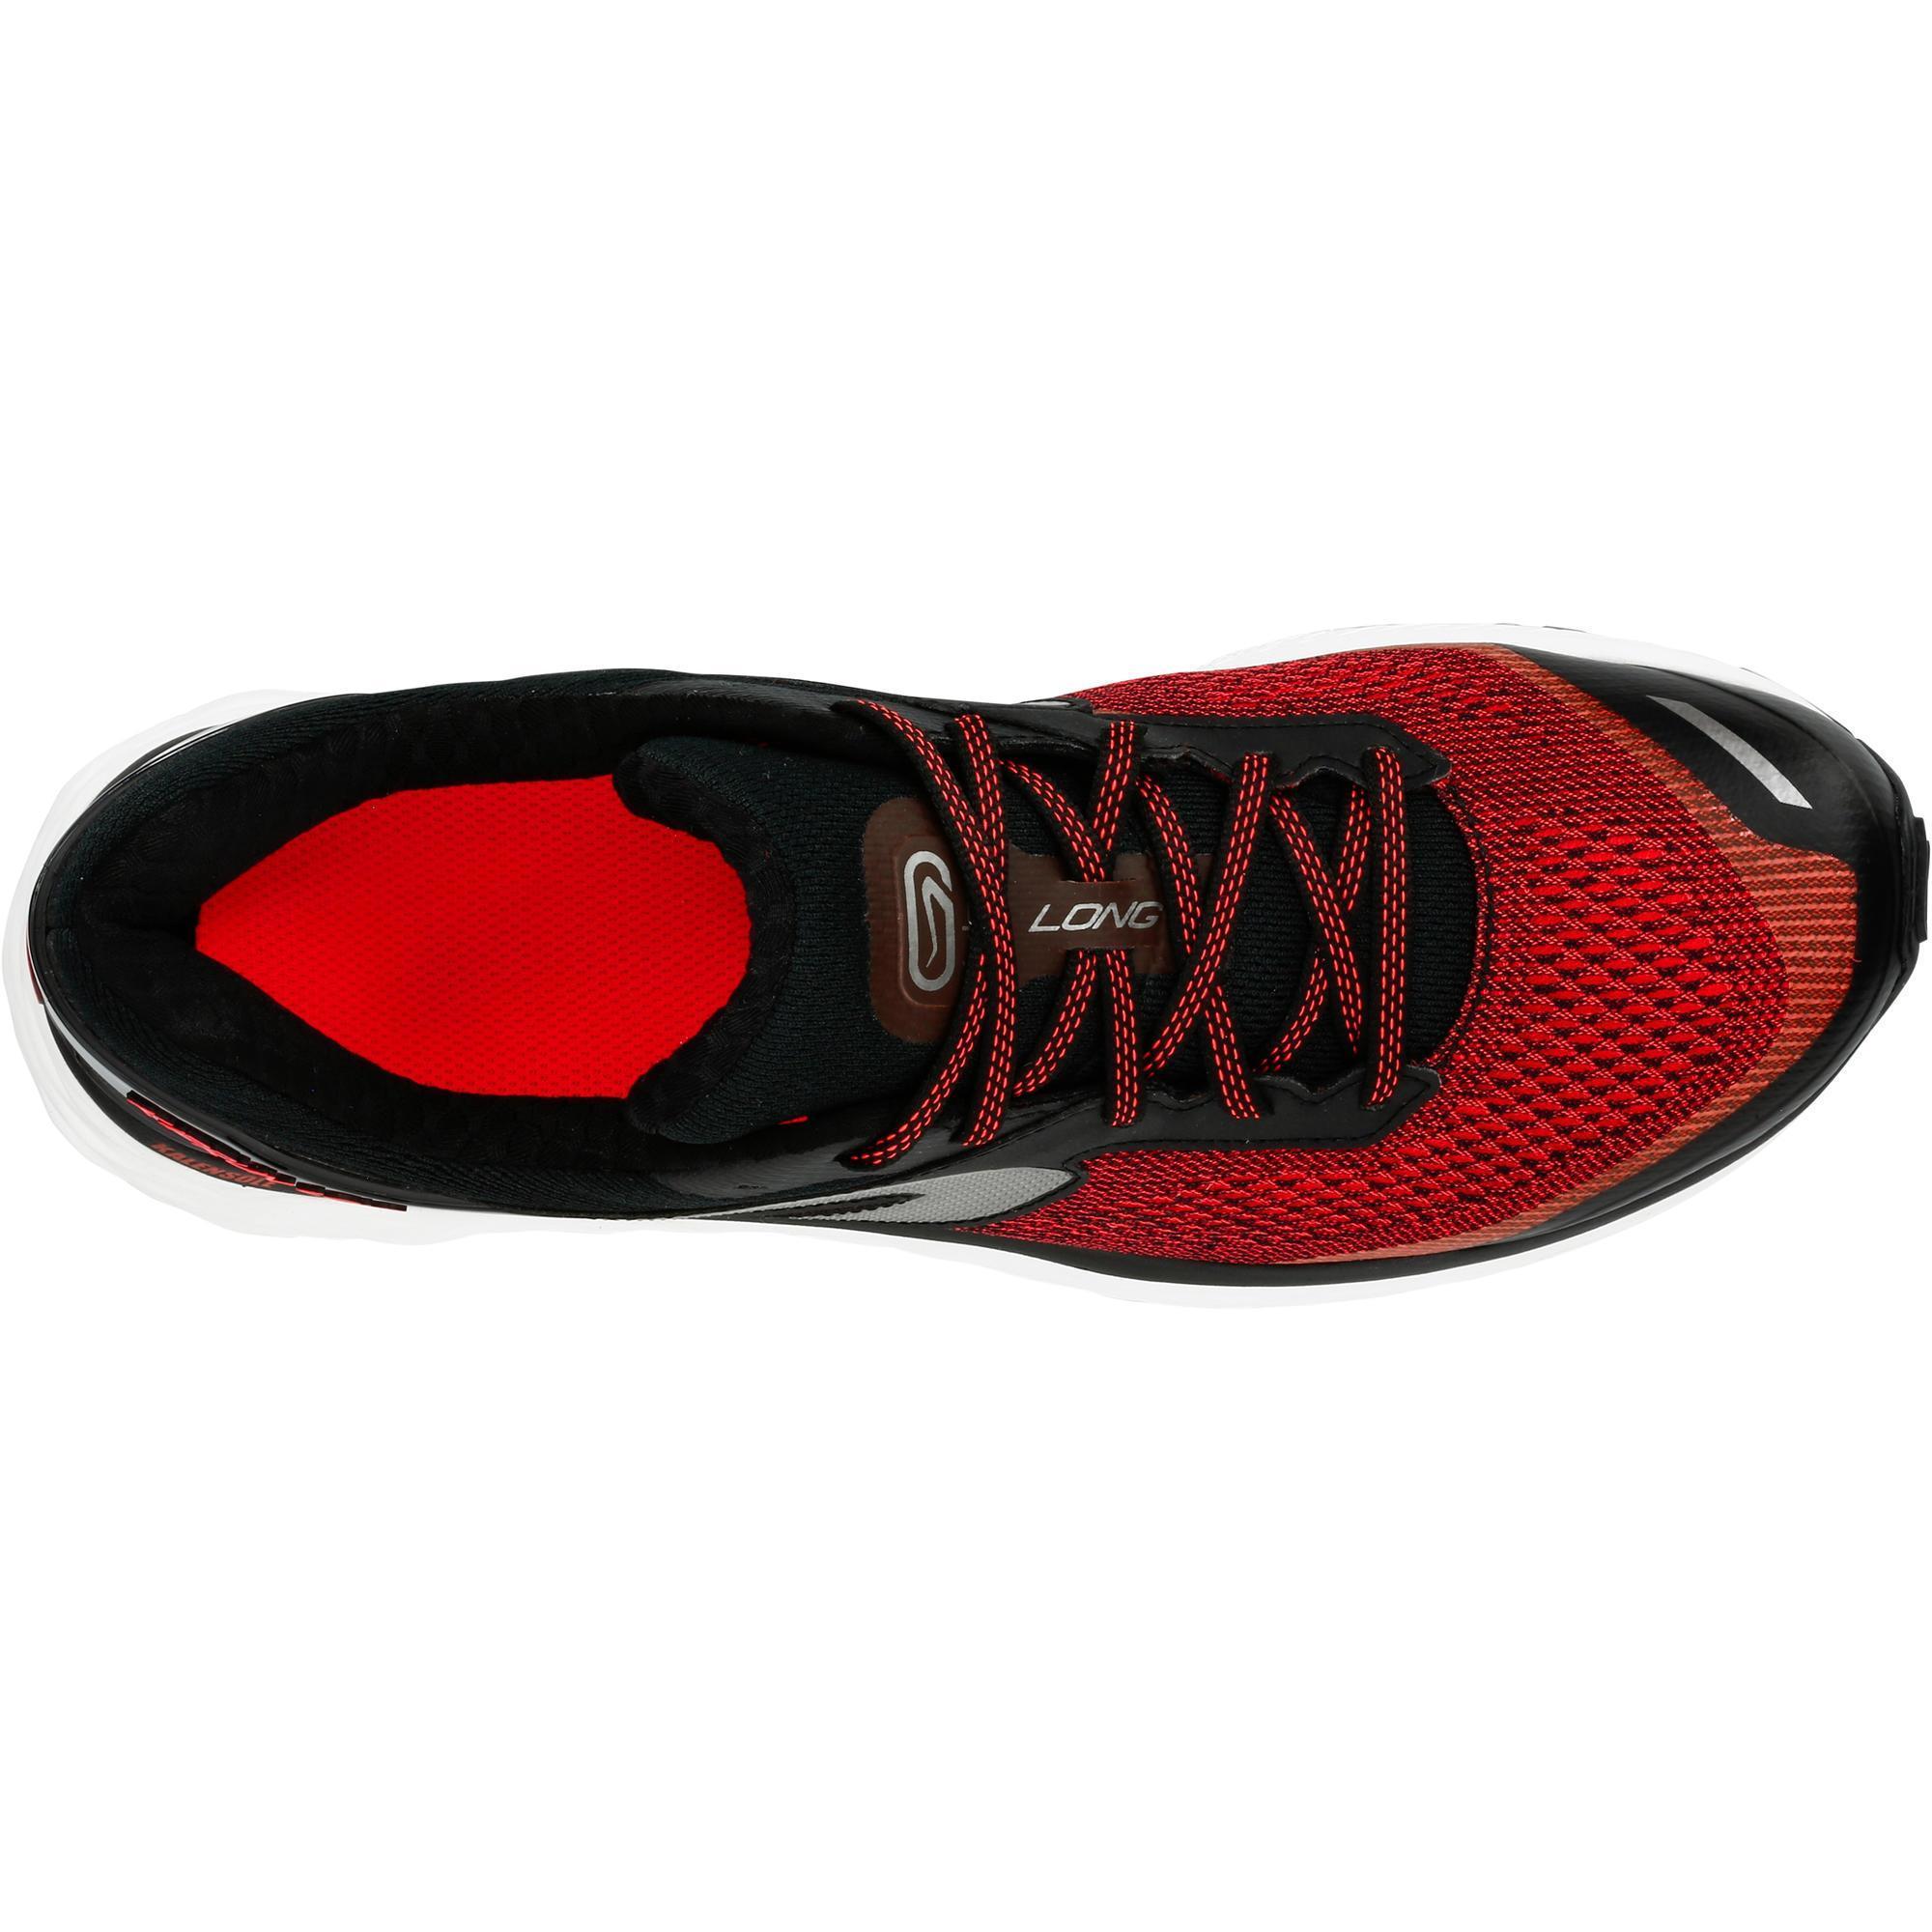 De Long Kalenji Udwqhhv Homme Kiprun Chaussures Decathlon Running PBwY8z8q 43b6fd9a7ce